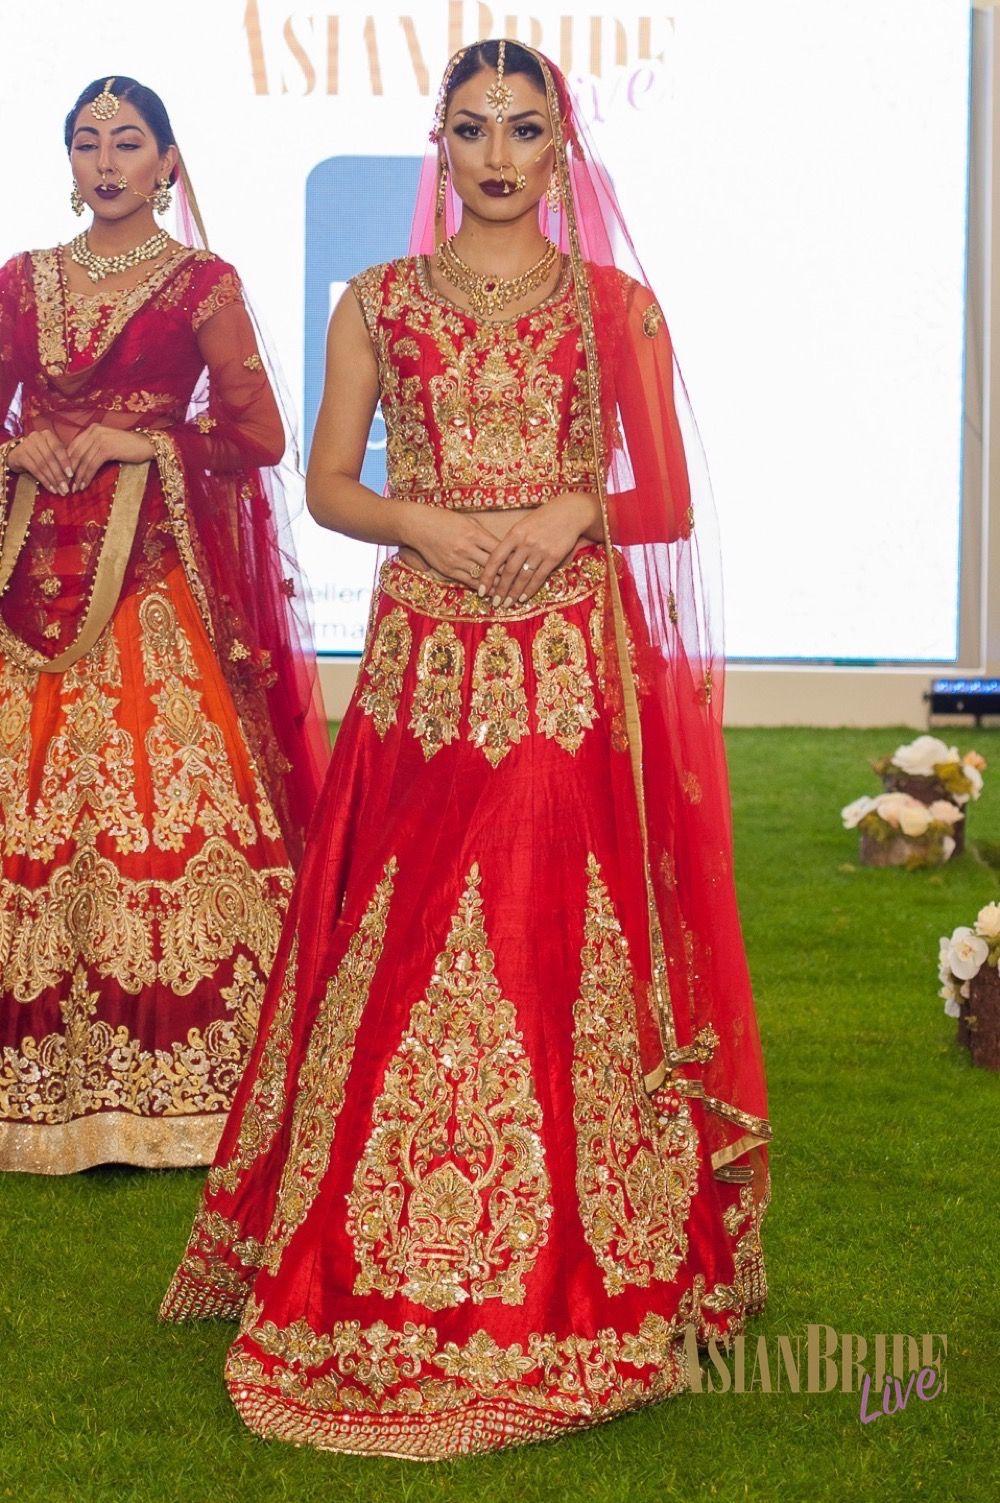 c5354a10186 Red   Gold Bridal Lengha Bibi London -INDIAN-PAKISTANI-WEDDING-FASHION